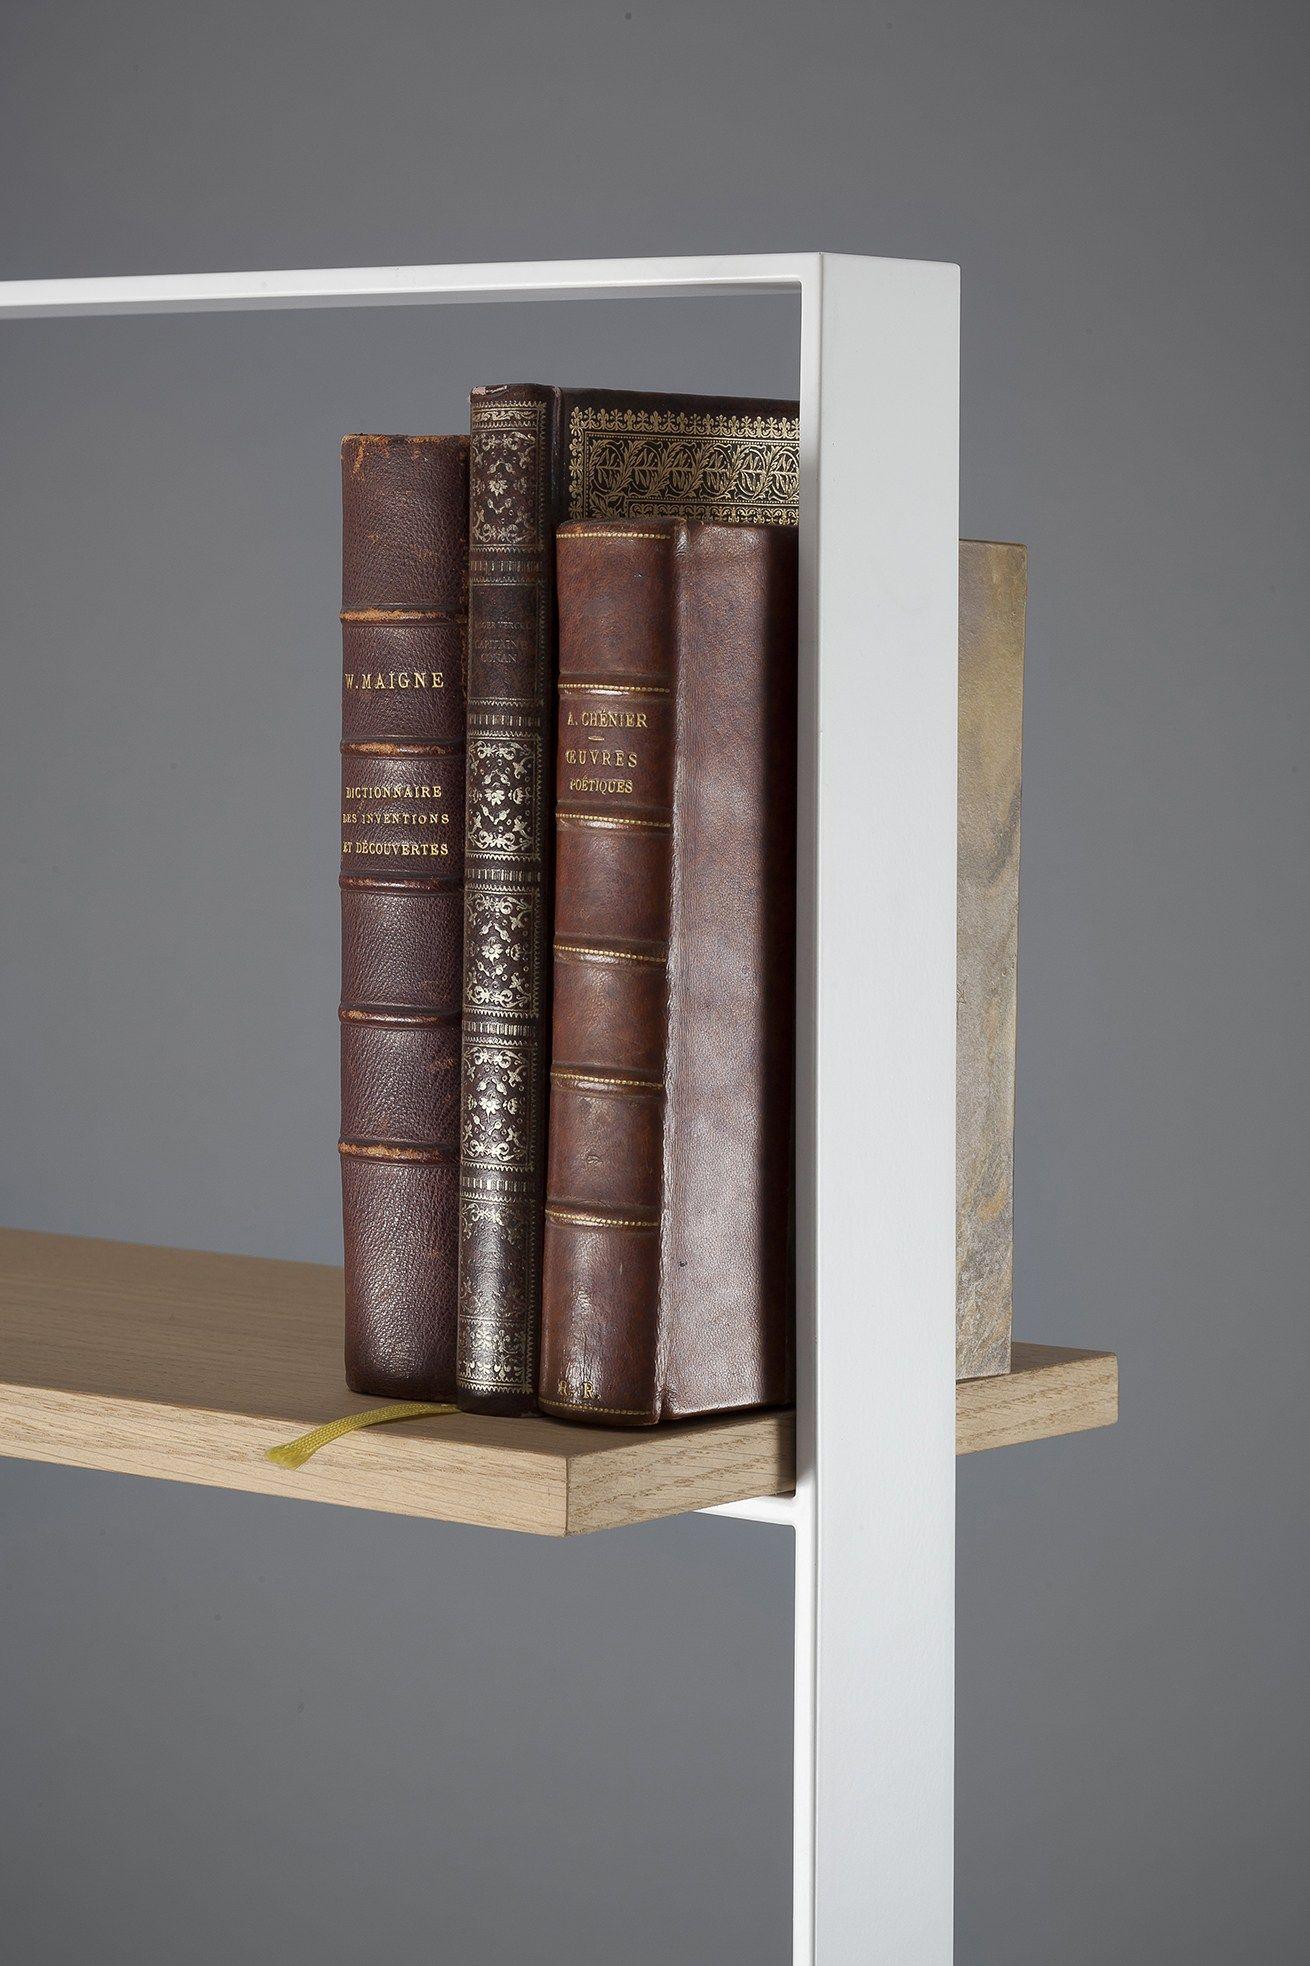 Striking The Severin Bookshelf Alex De Rouvray Exhibition